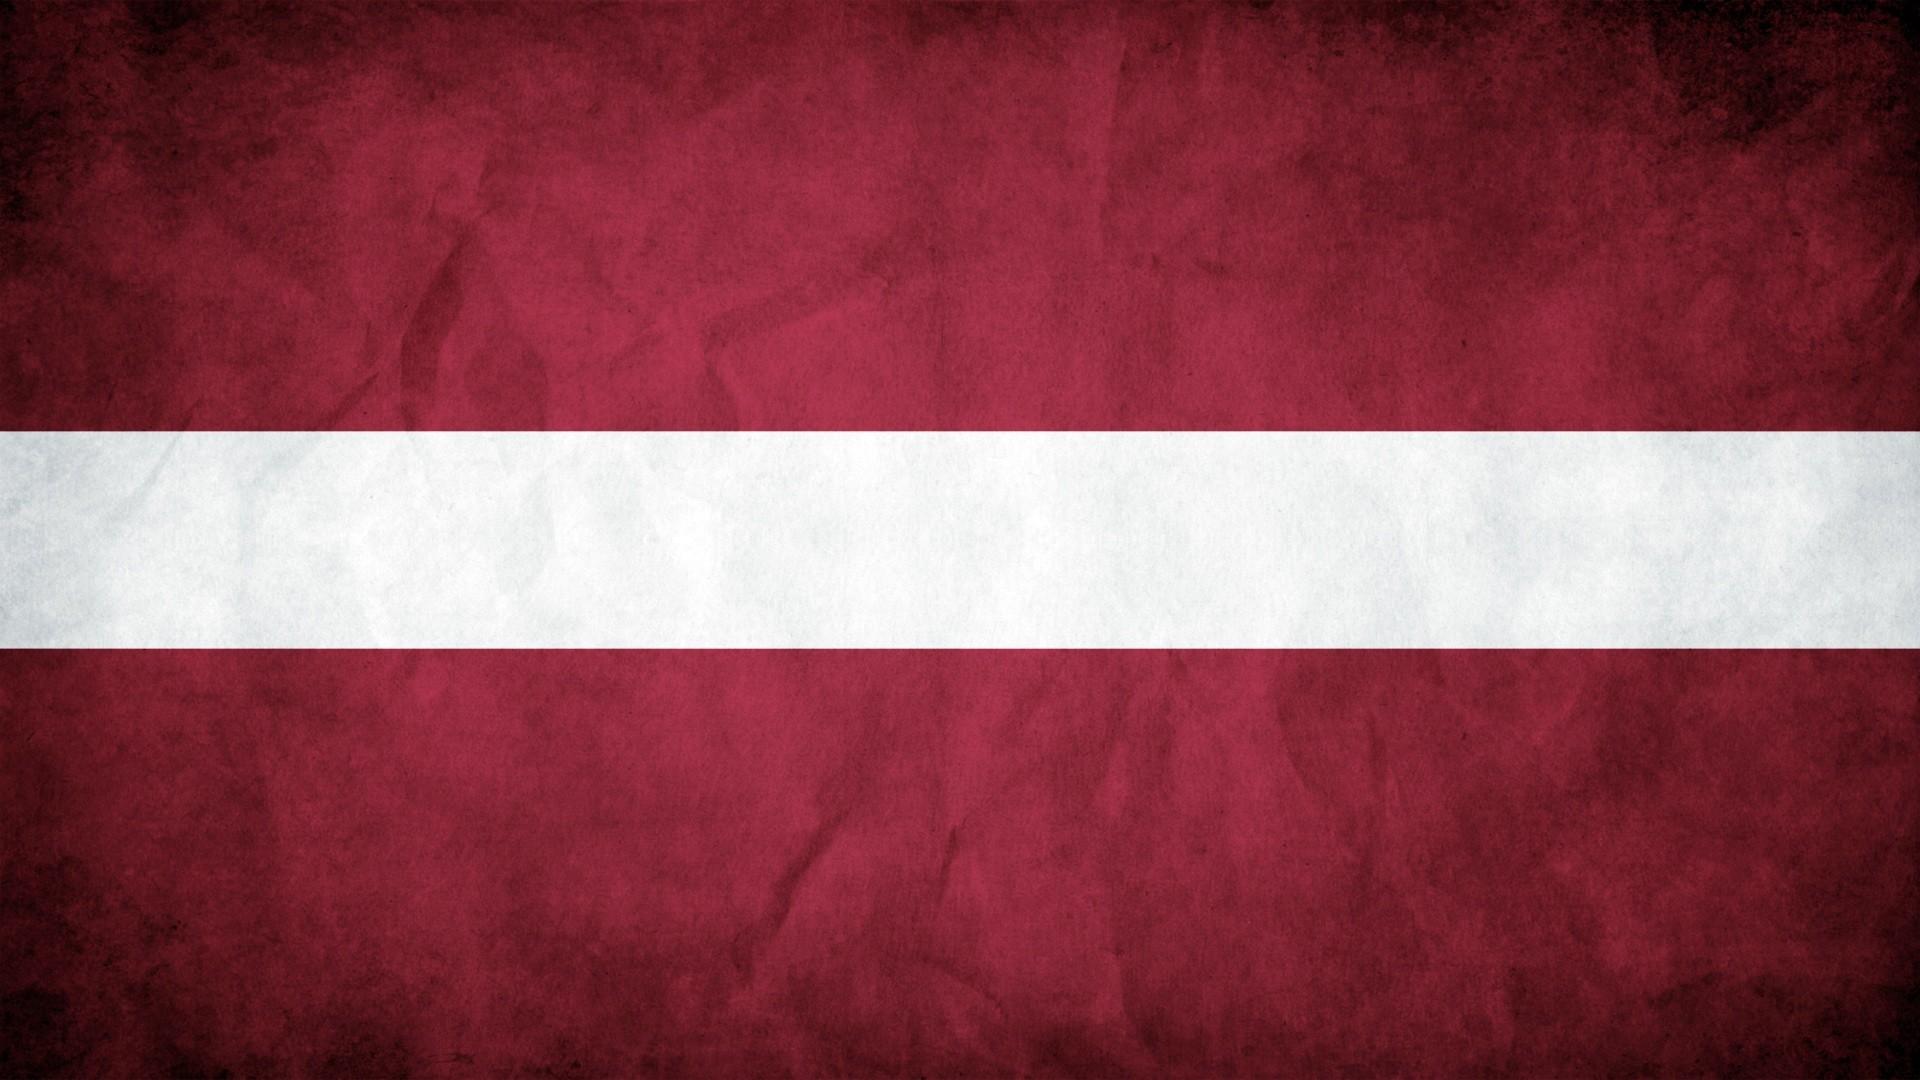 1920x1080 Panama-Flag-Wallpaper.jpg (1920×1080)